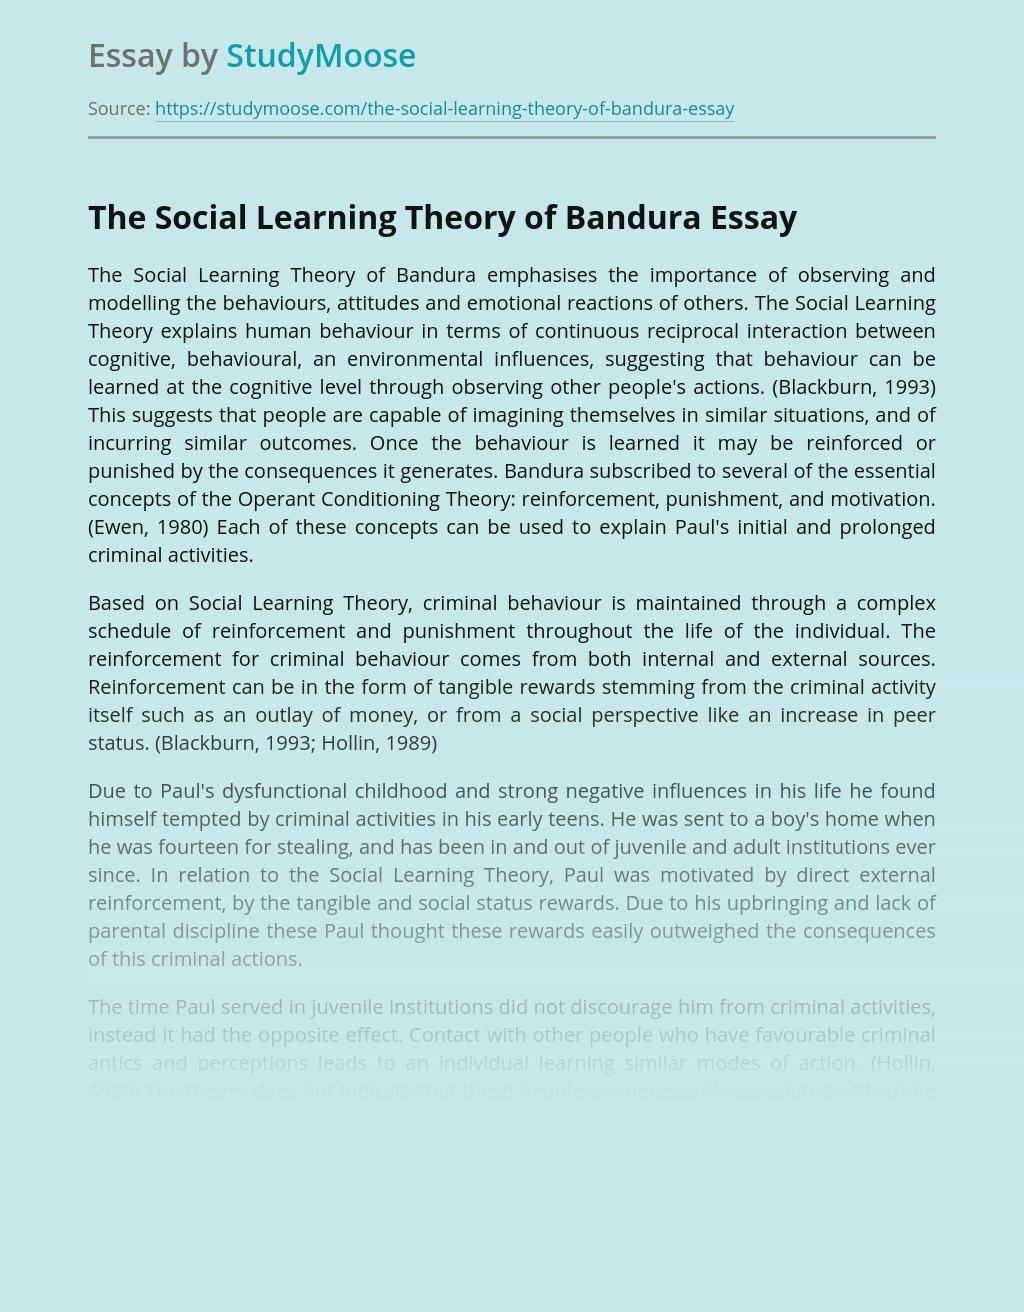 The Social Learning Theory of Bandura